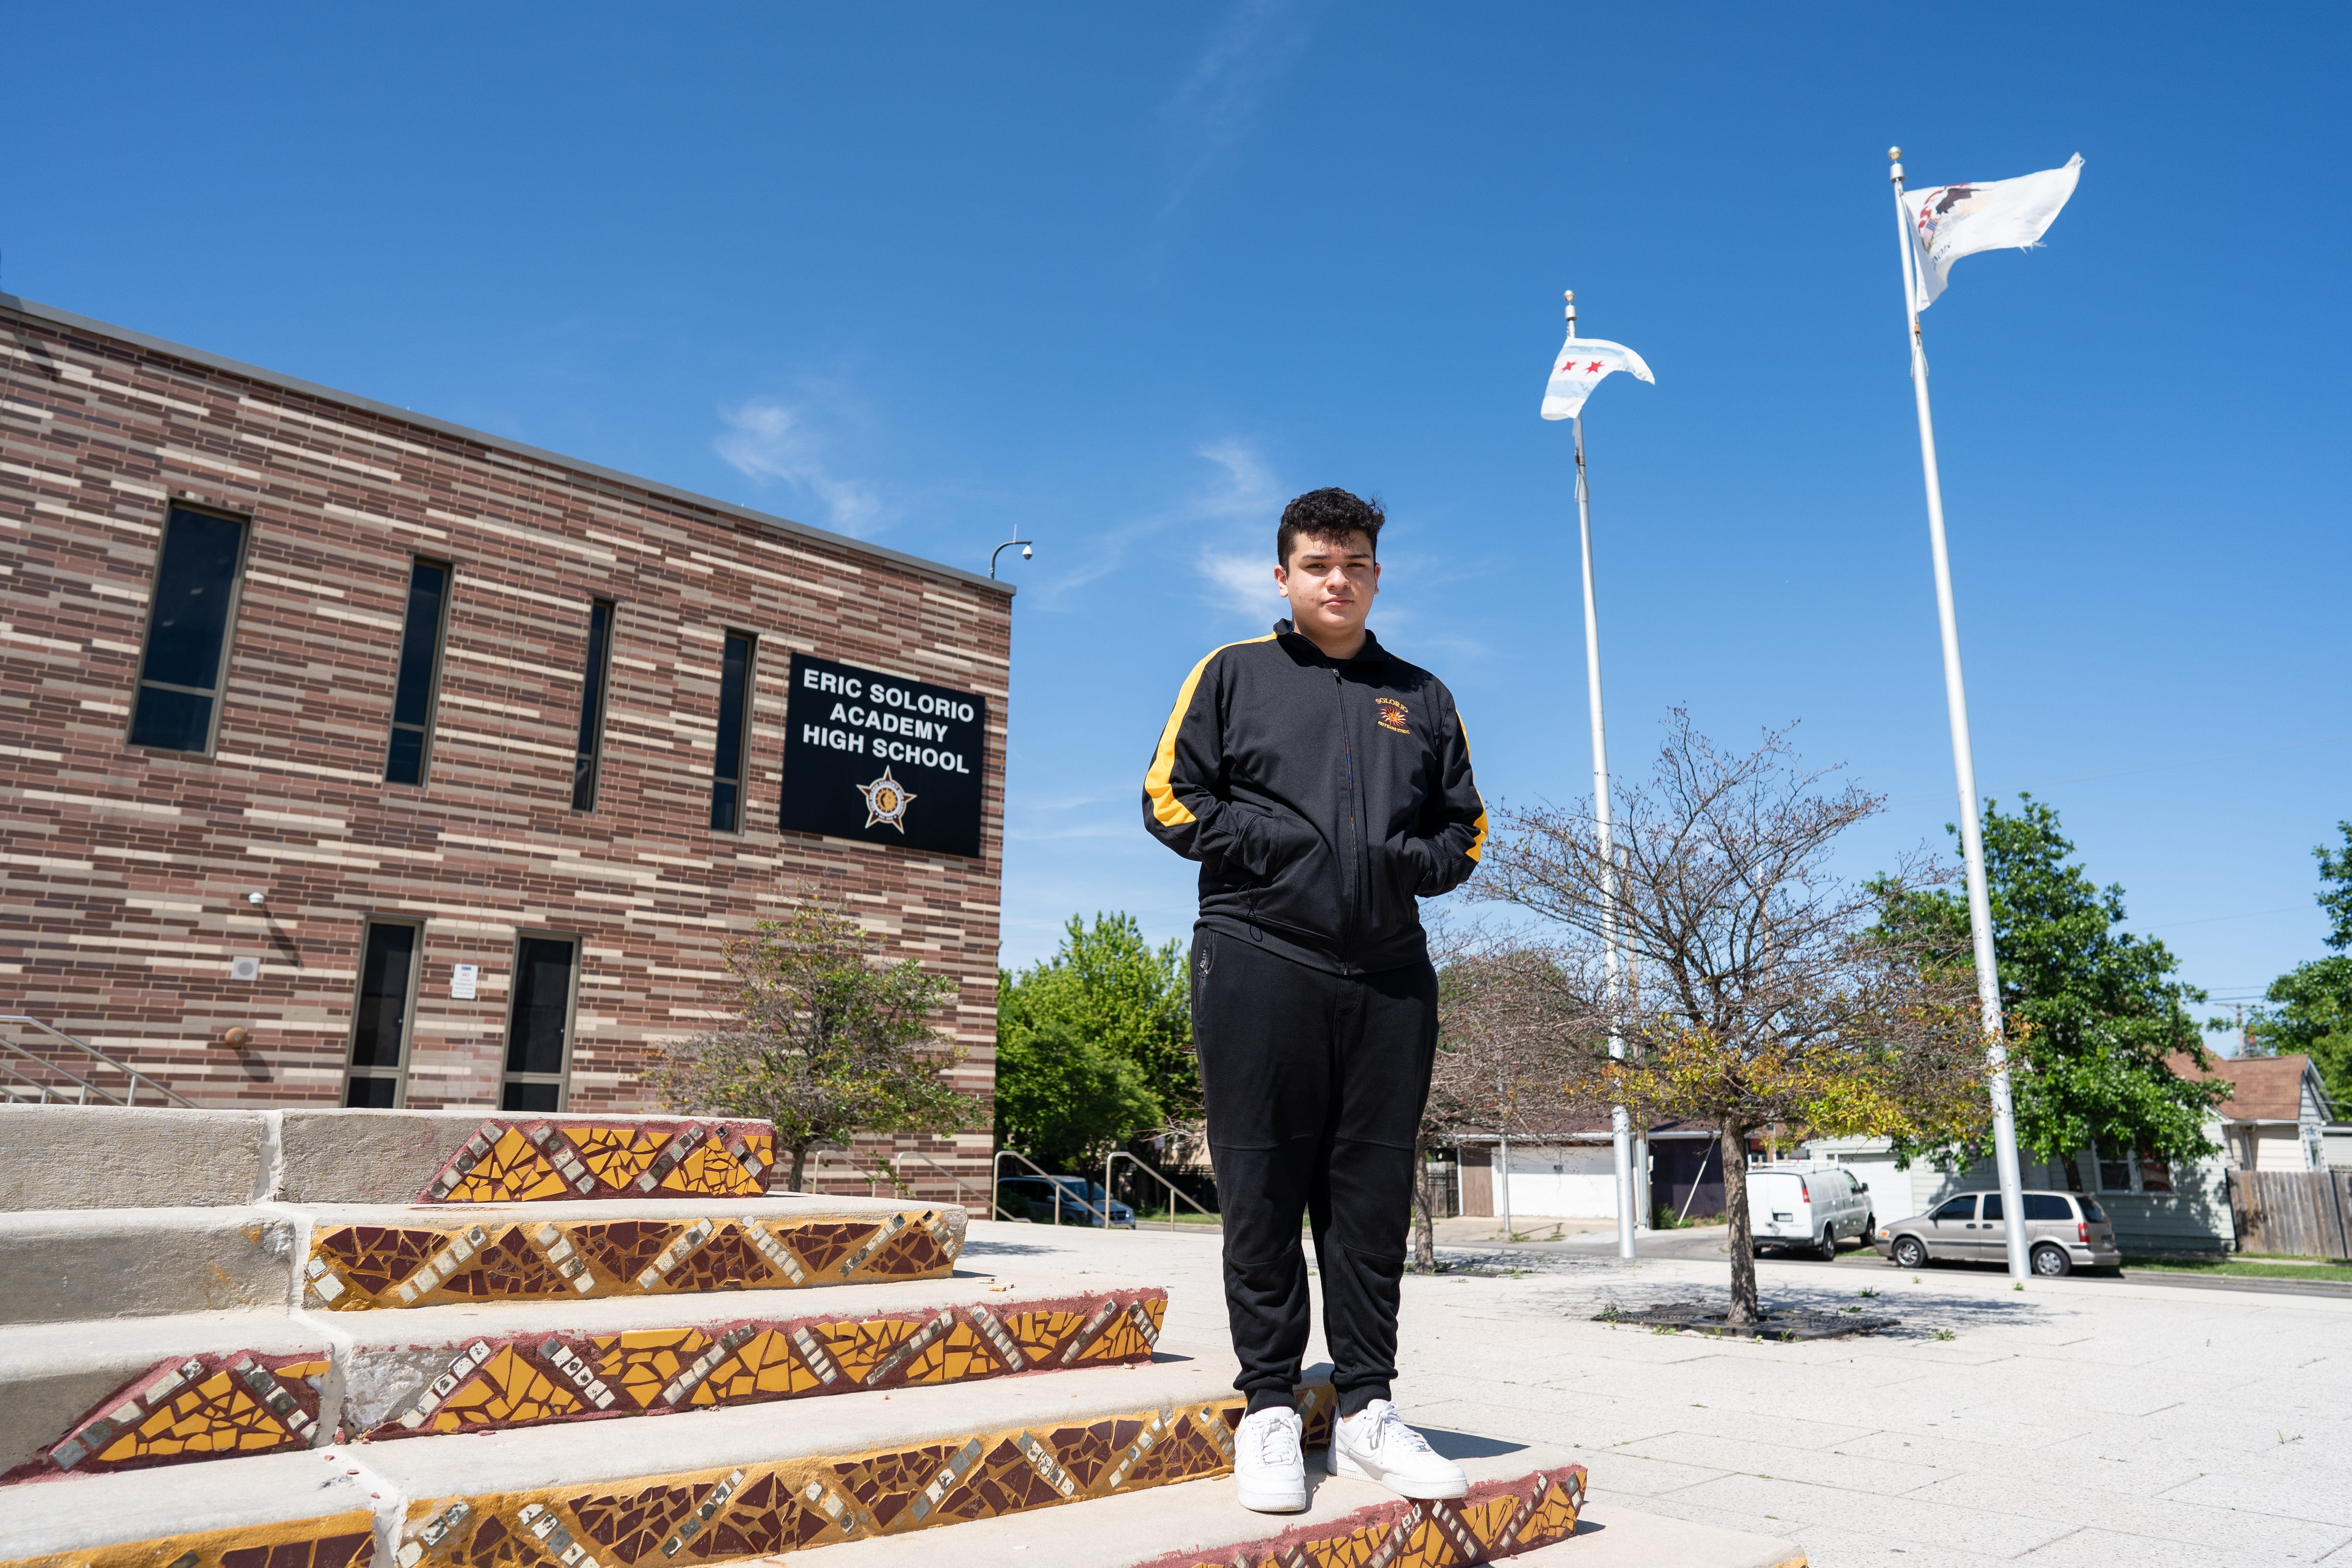 Leonel Gonzalez outside of Solorio Academy High School